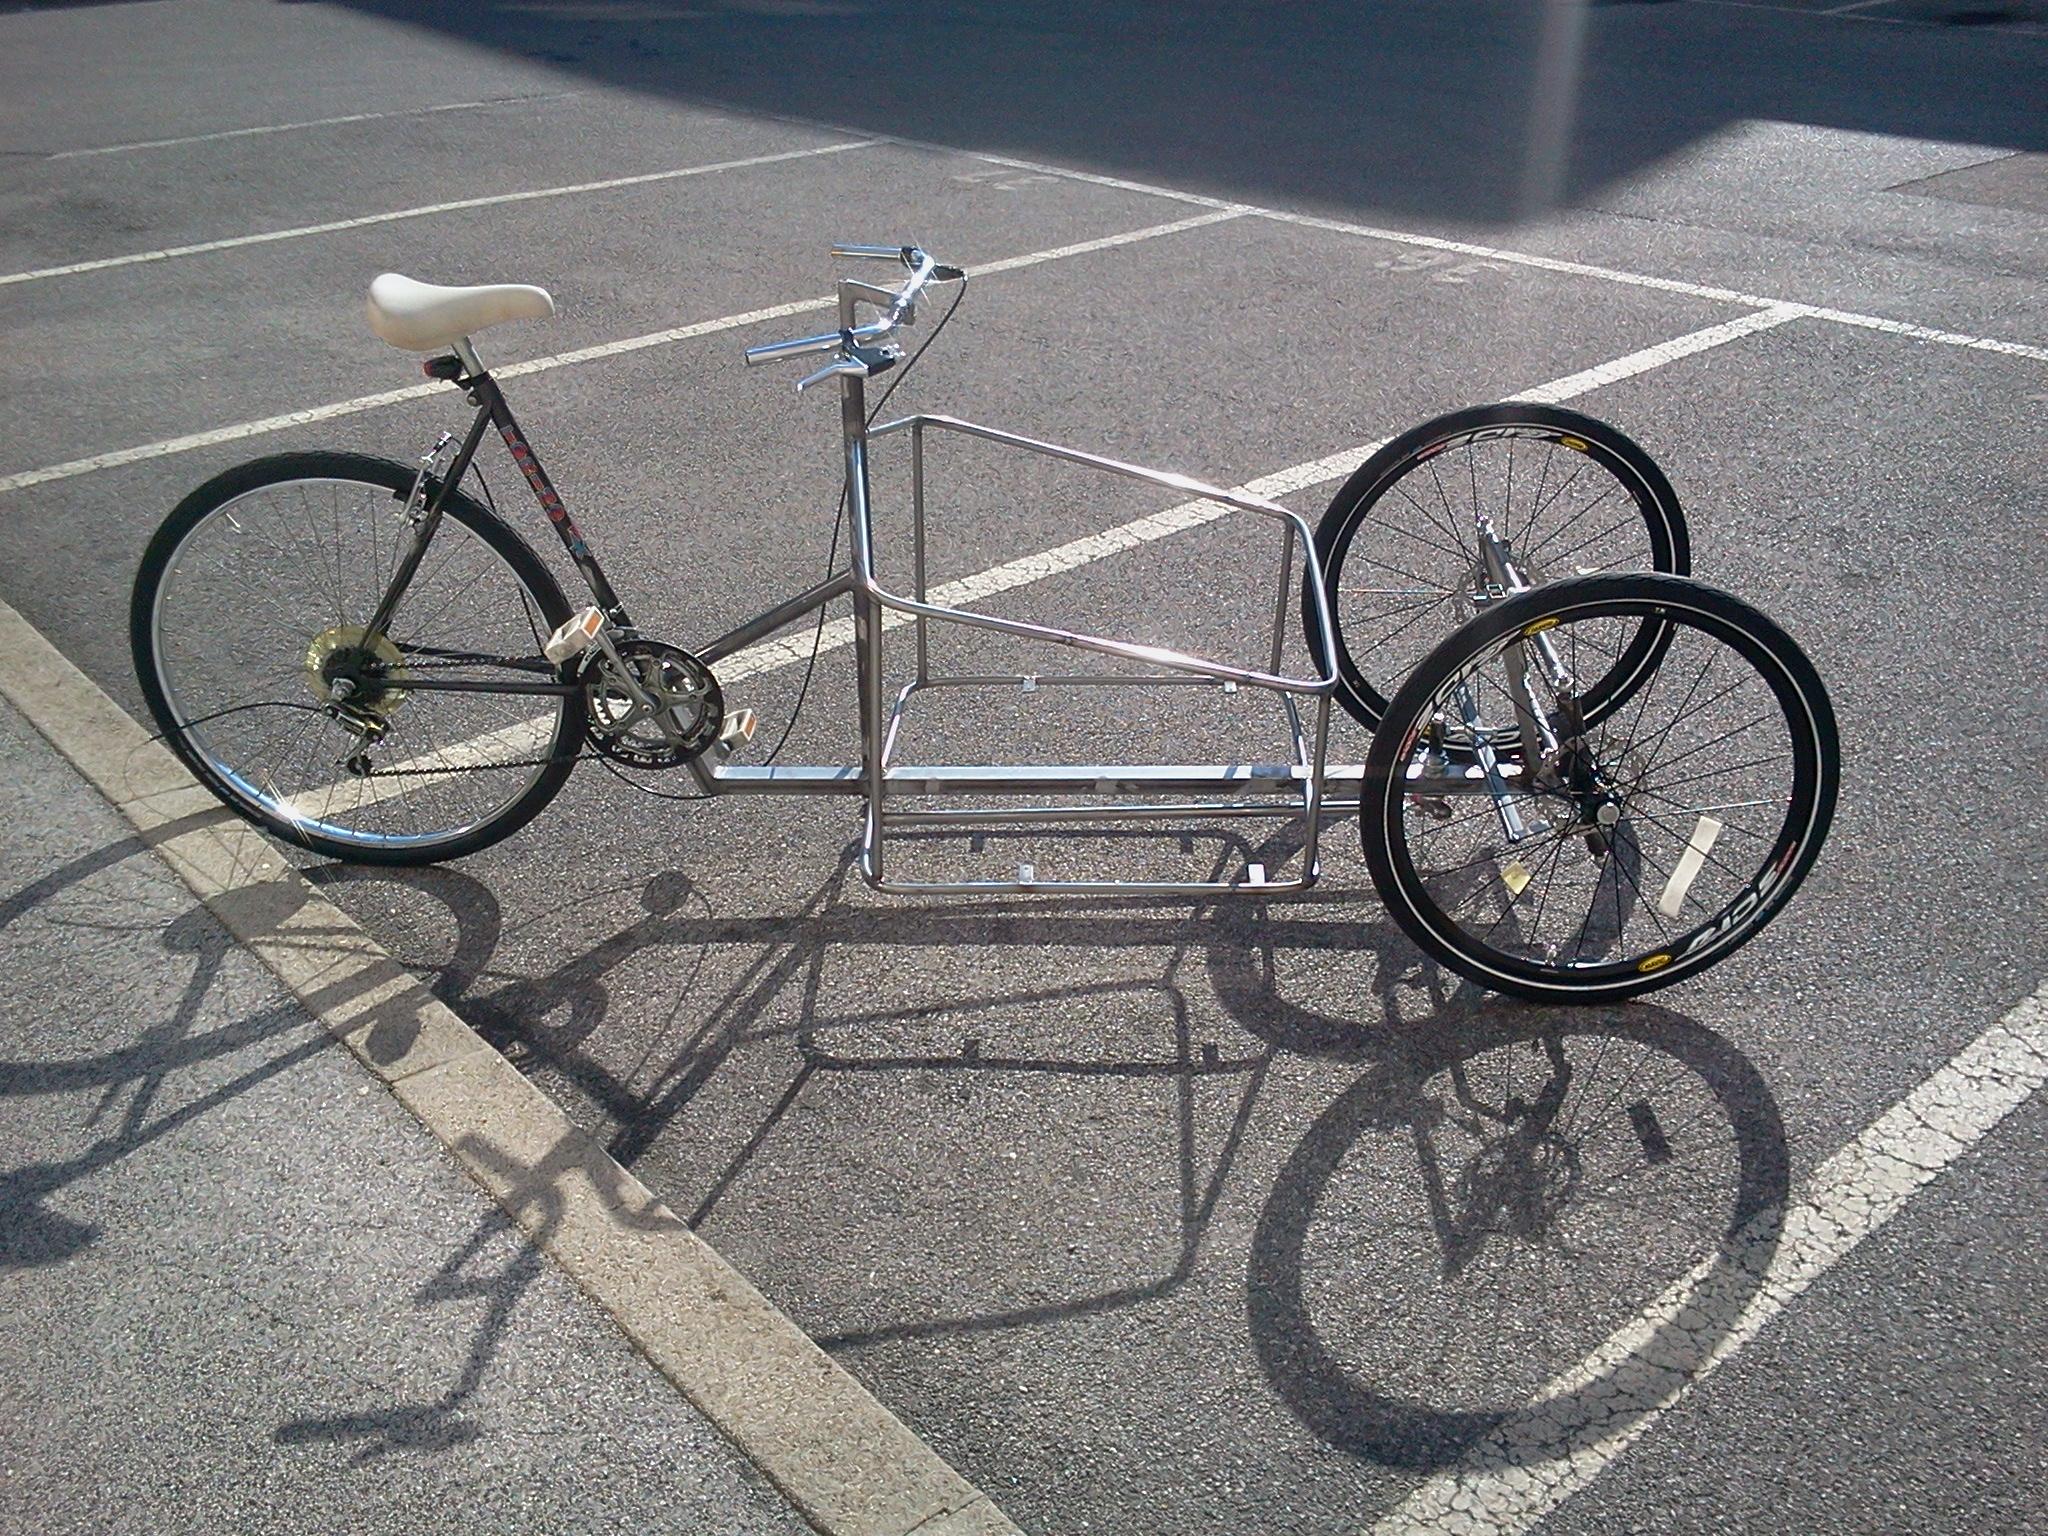 fail: a full tilting 3-wheeled cargo bike